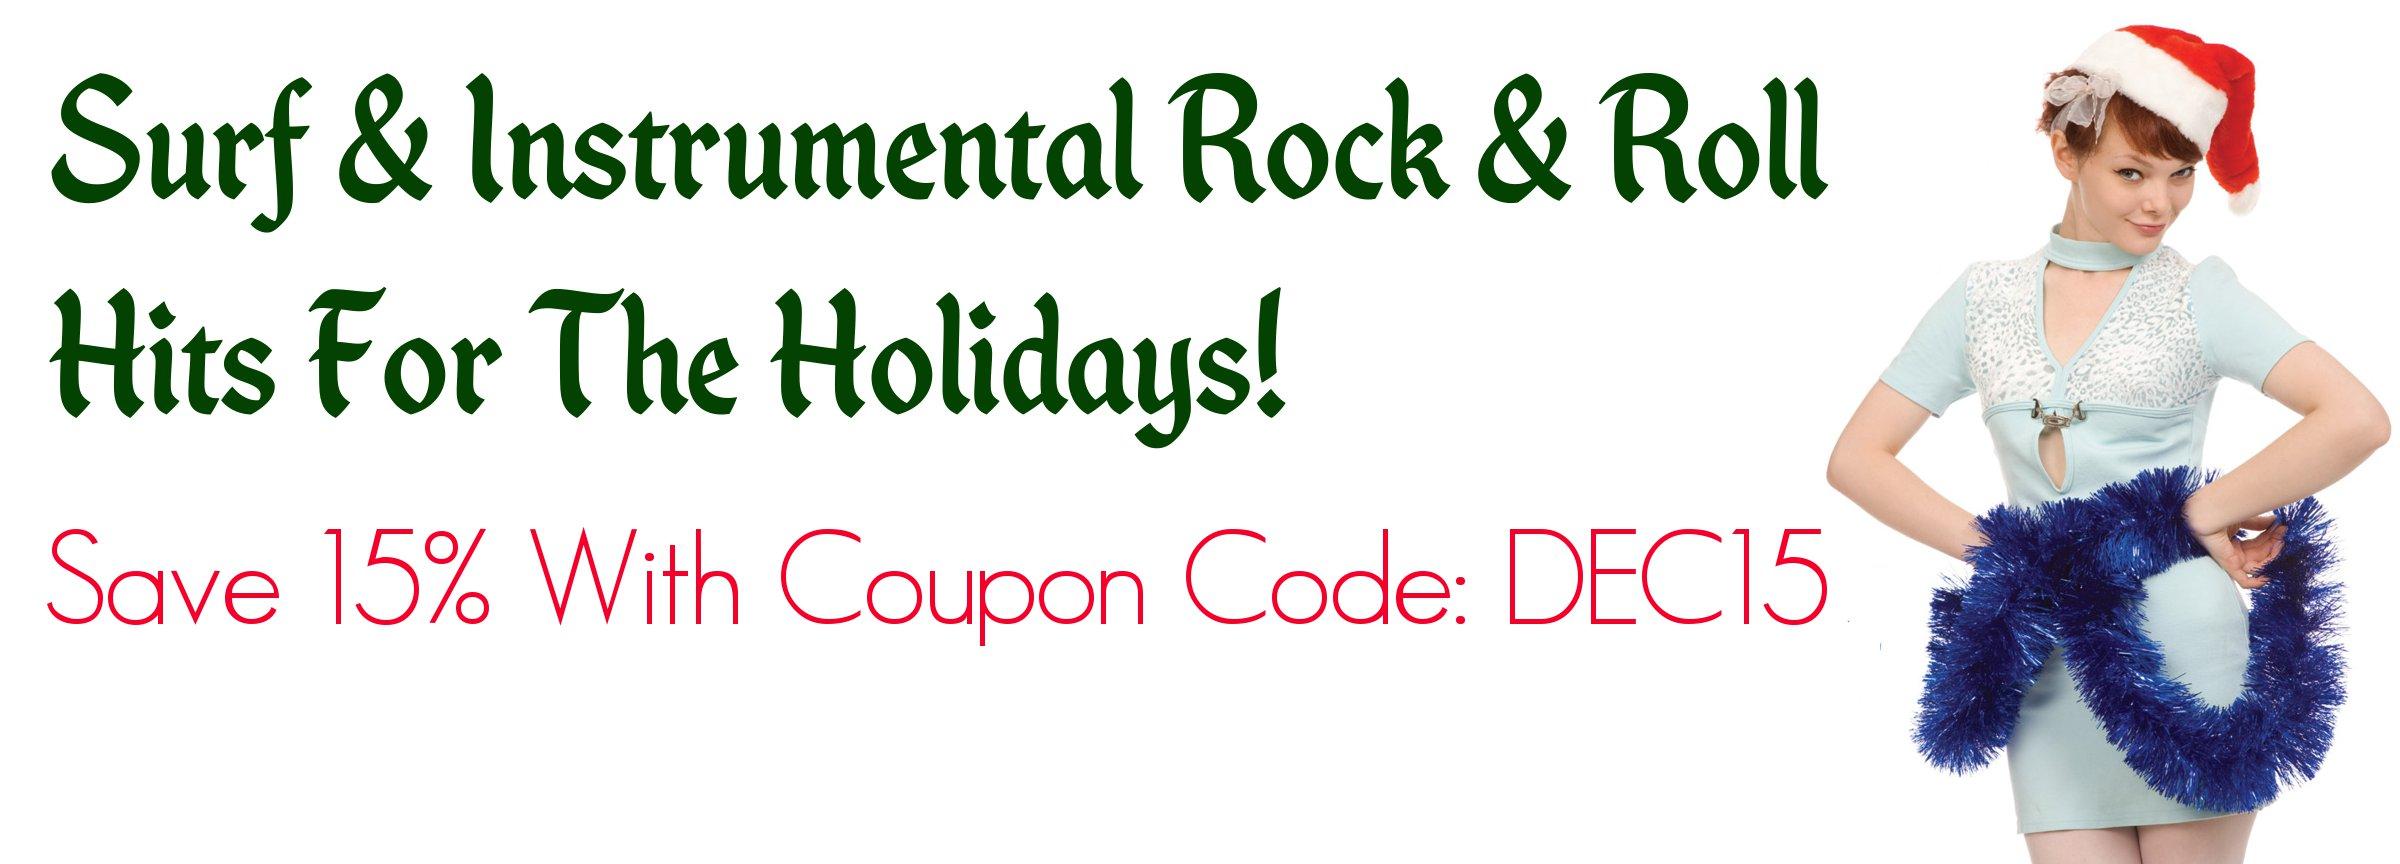 holidaybanneradfornewdcwebsite-2012.jpg